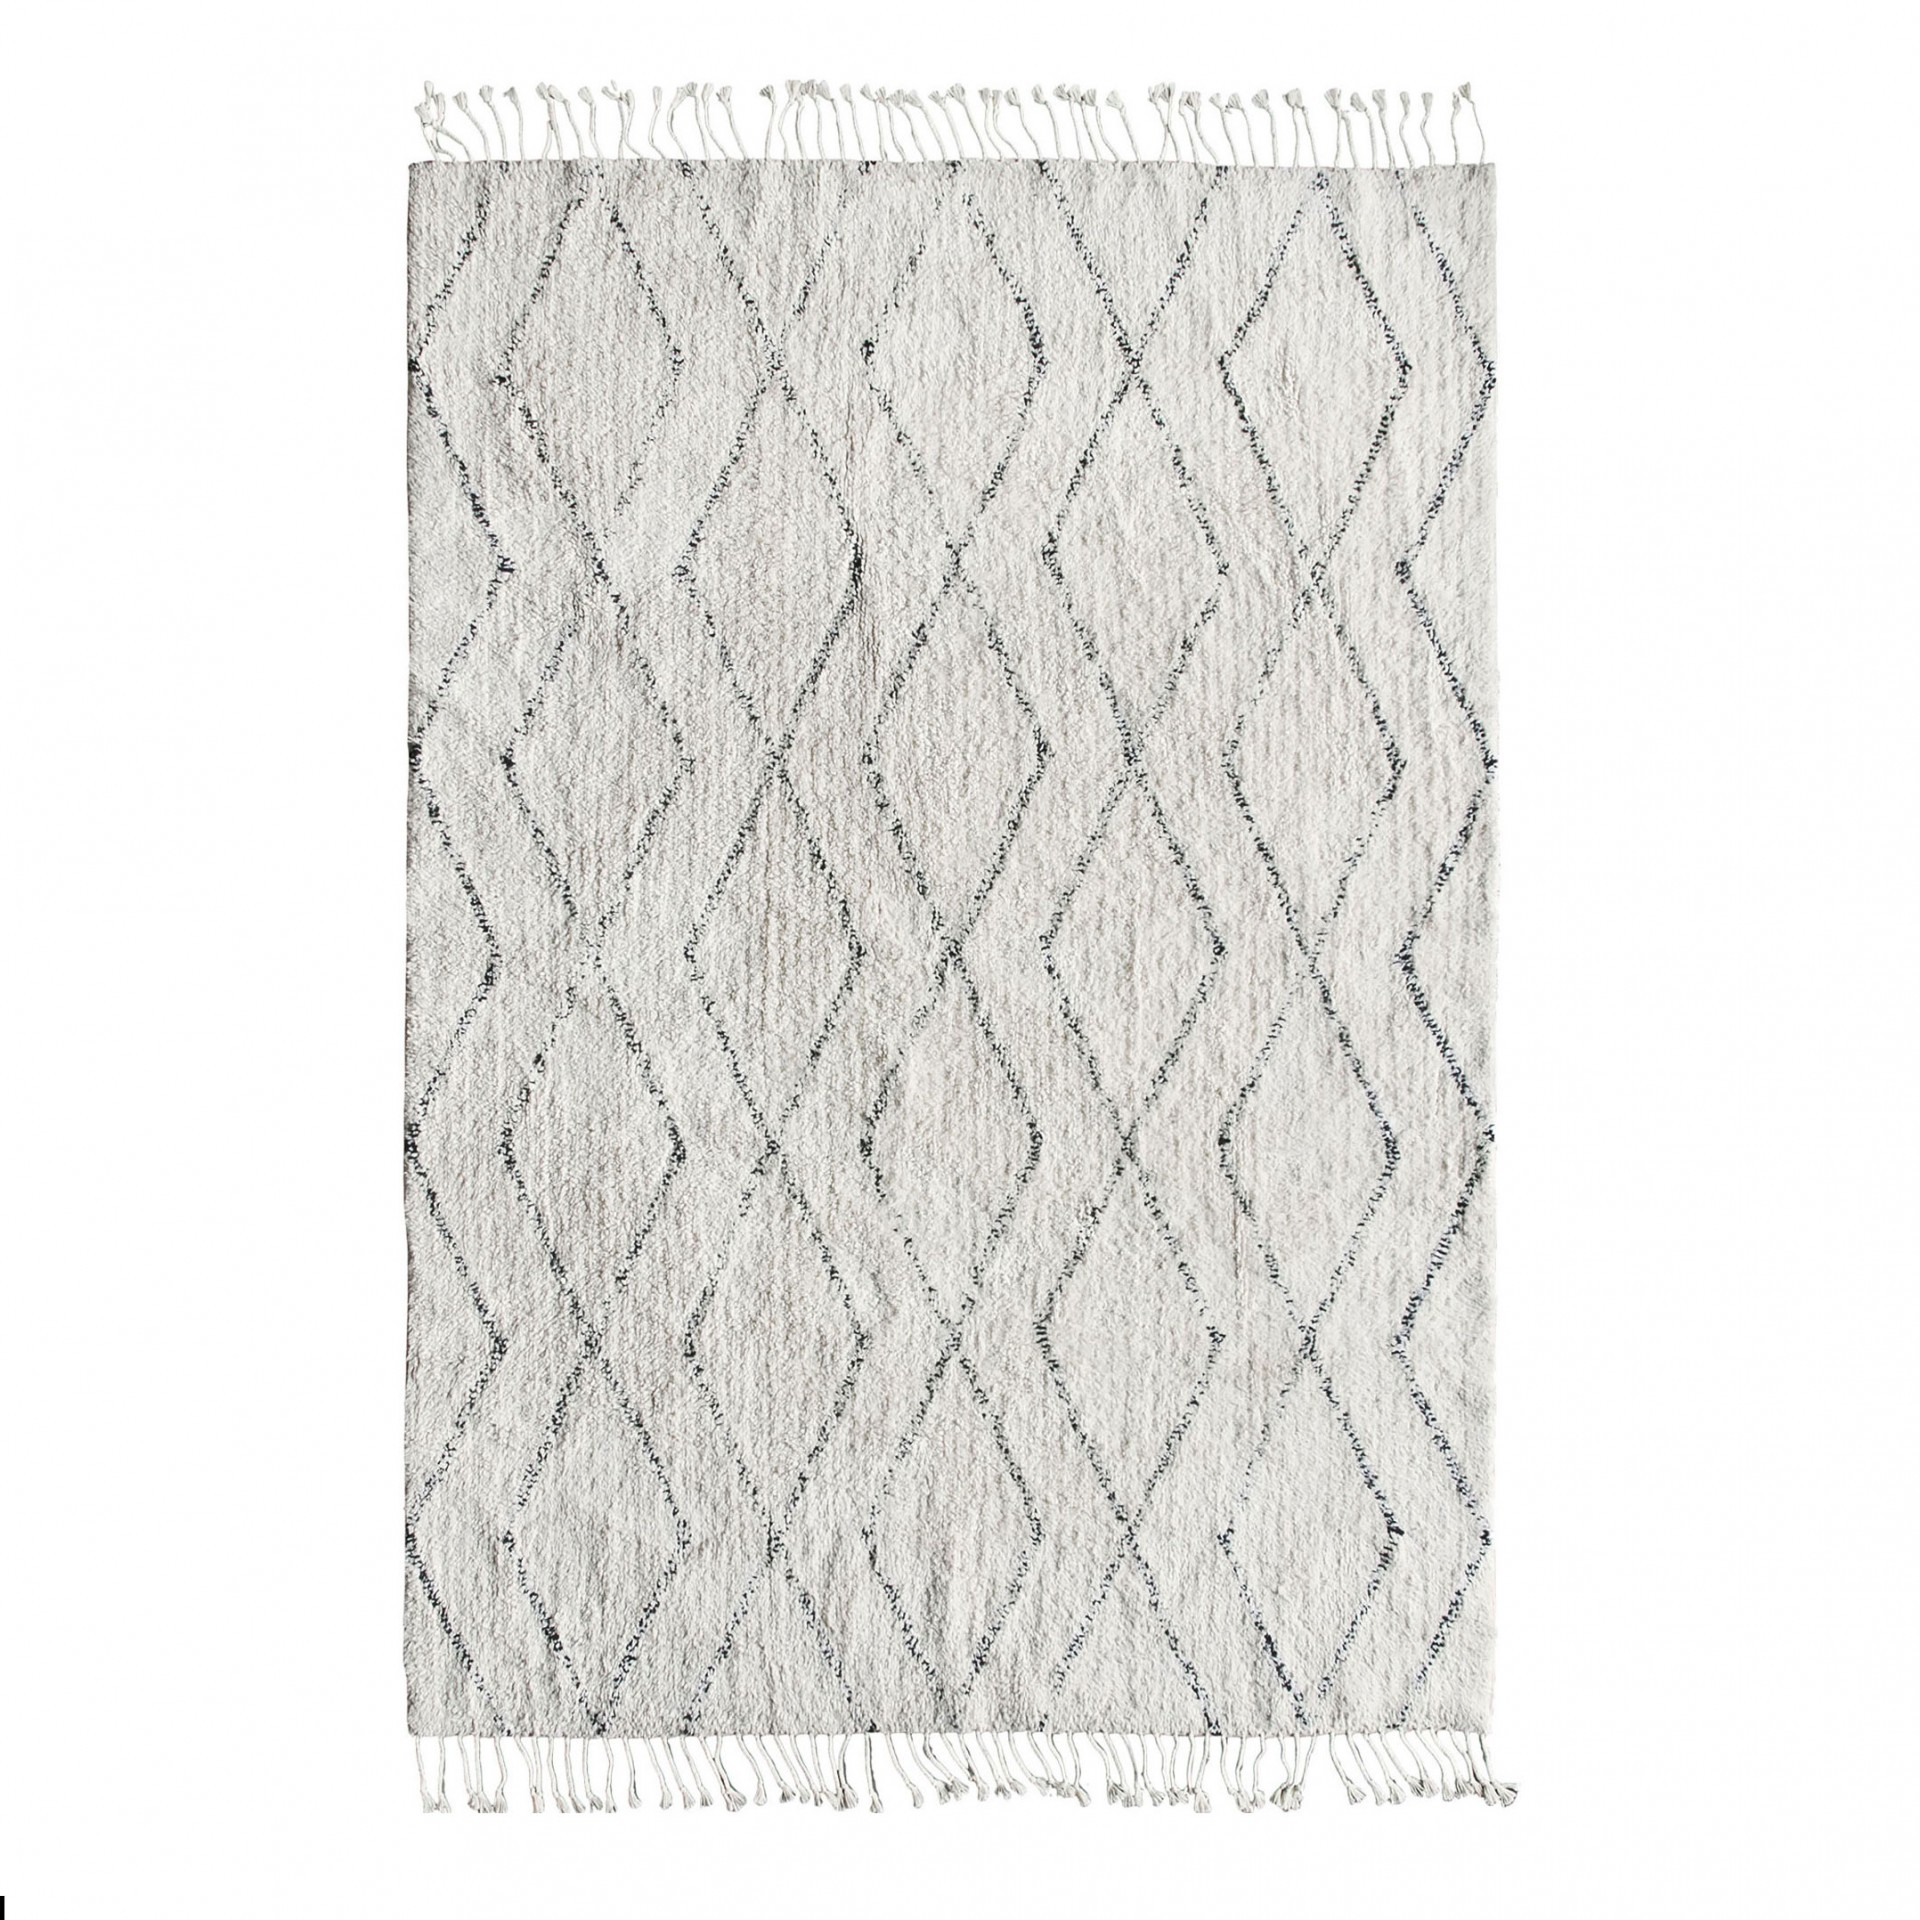 Tapete c/franjas, algodão, branco/preto, 200x140